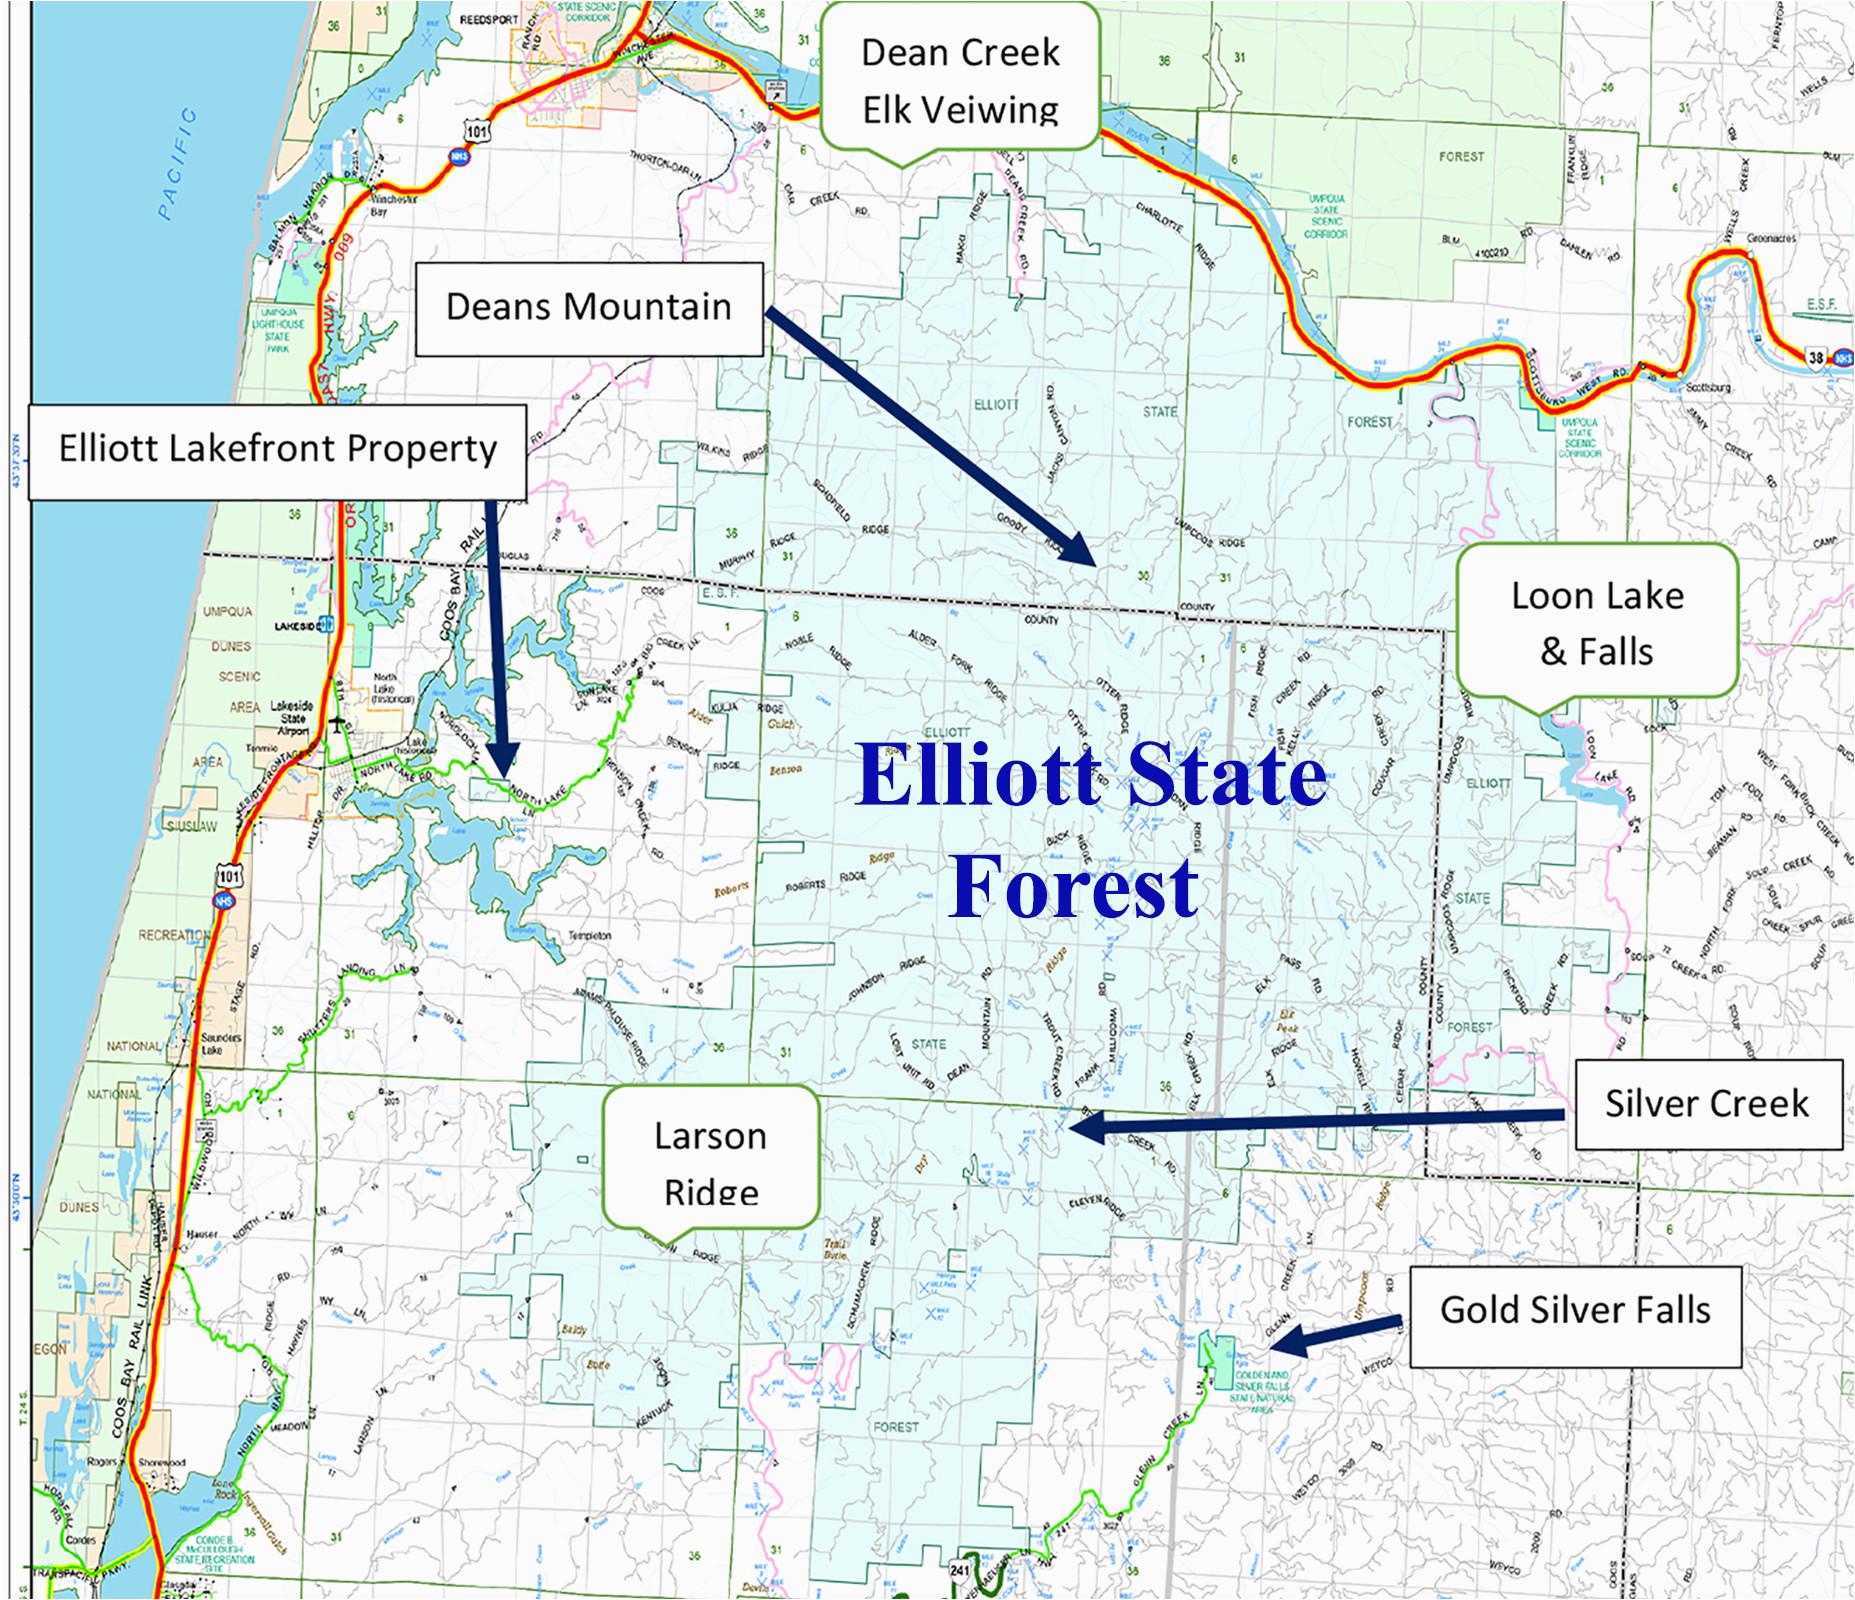 orww elliott state forest 2018 swocc draft recreation plan chapter